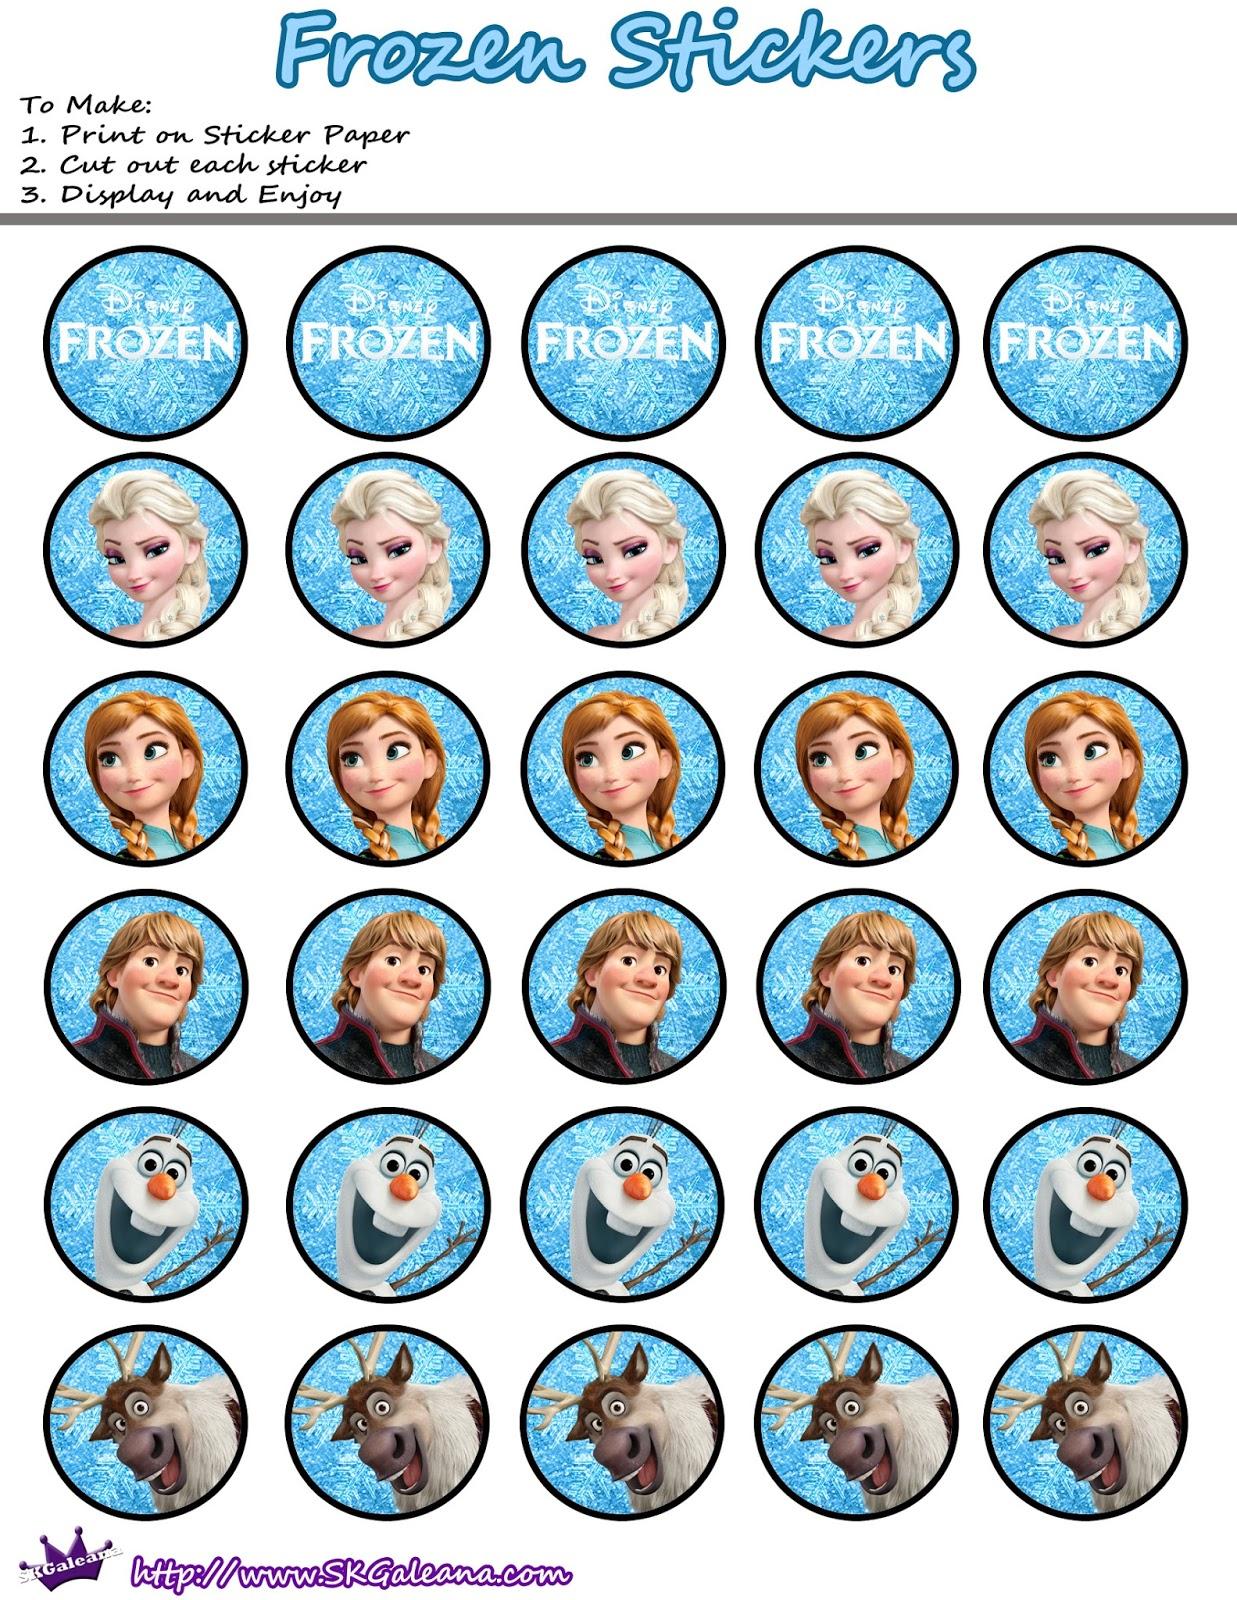 Printable Stickers Frozen